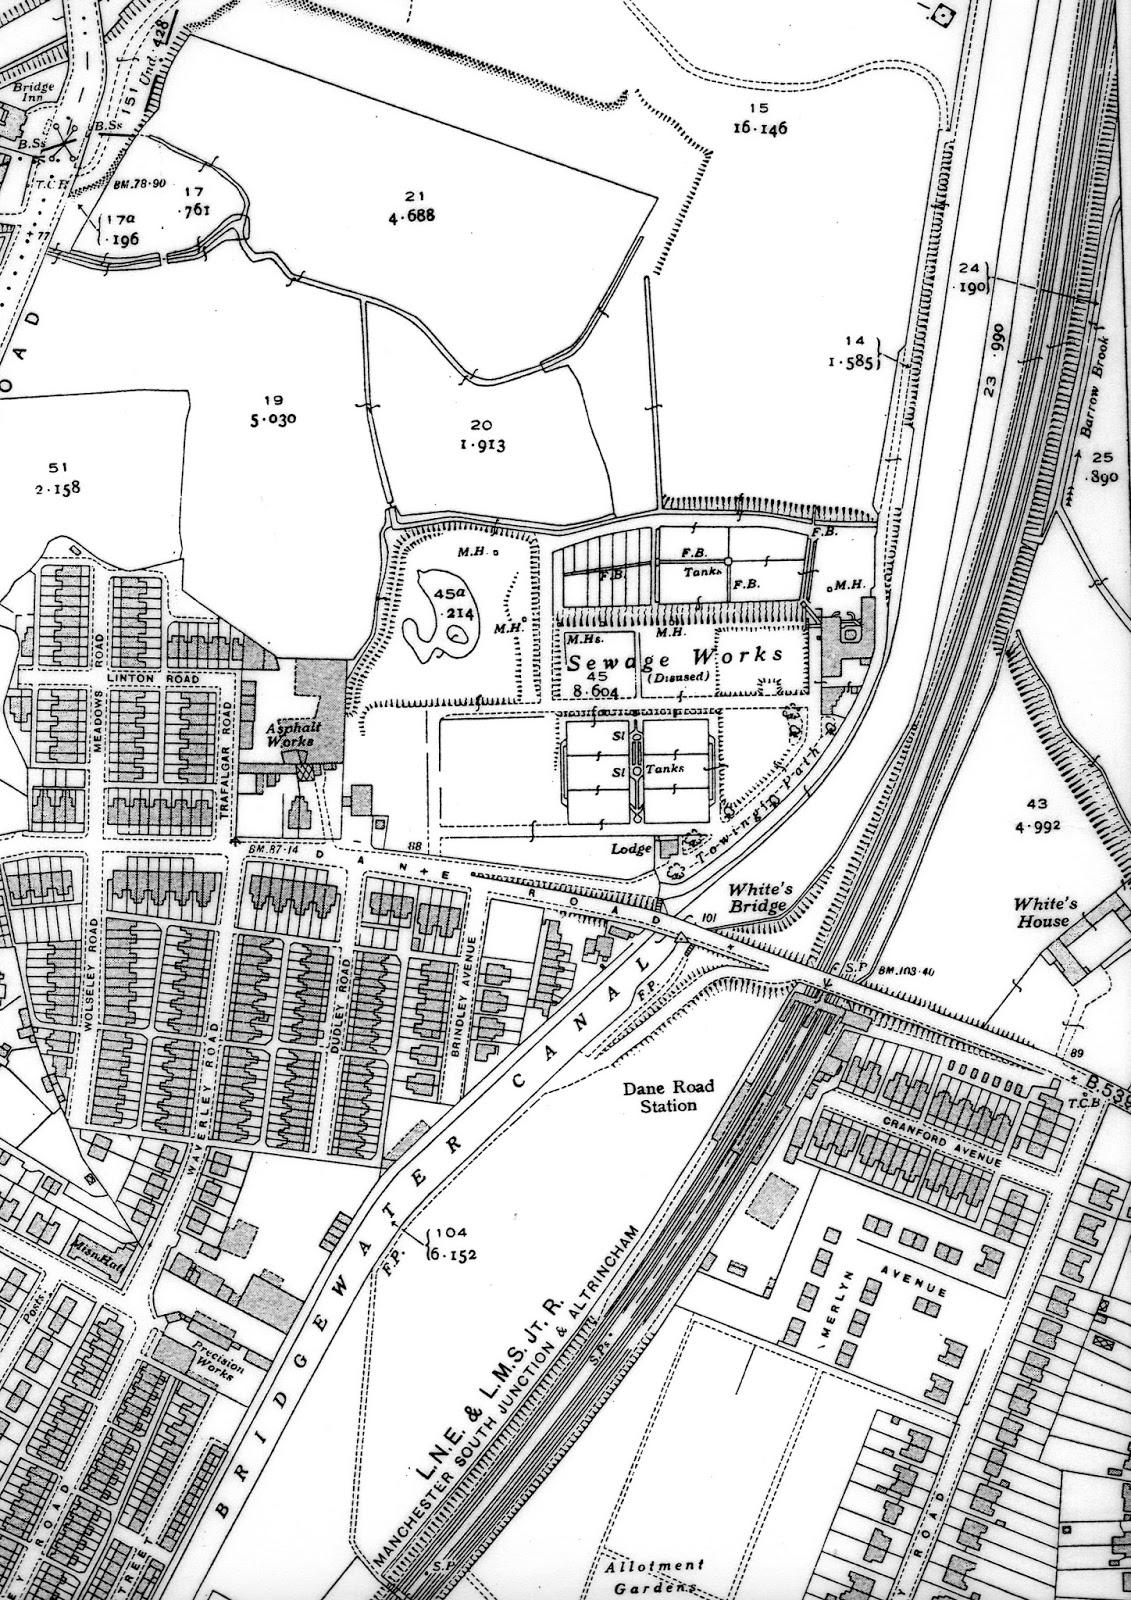 1930 map of white s bridge and wharves